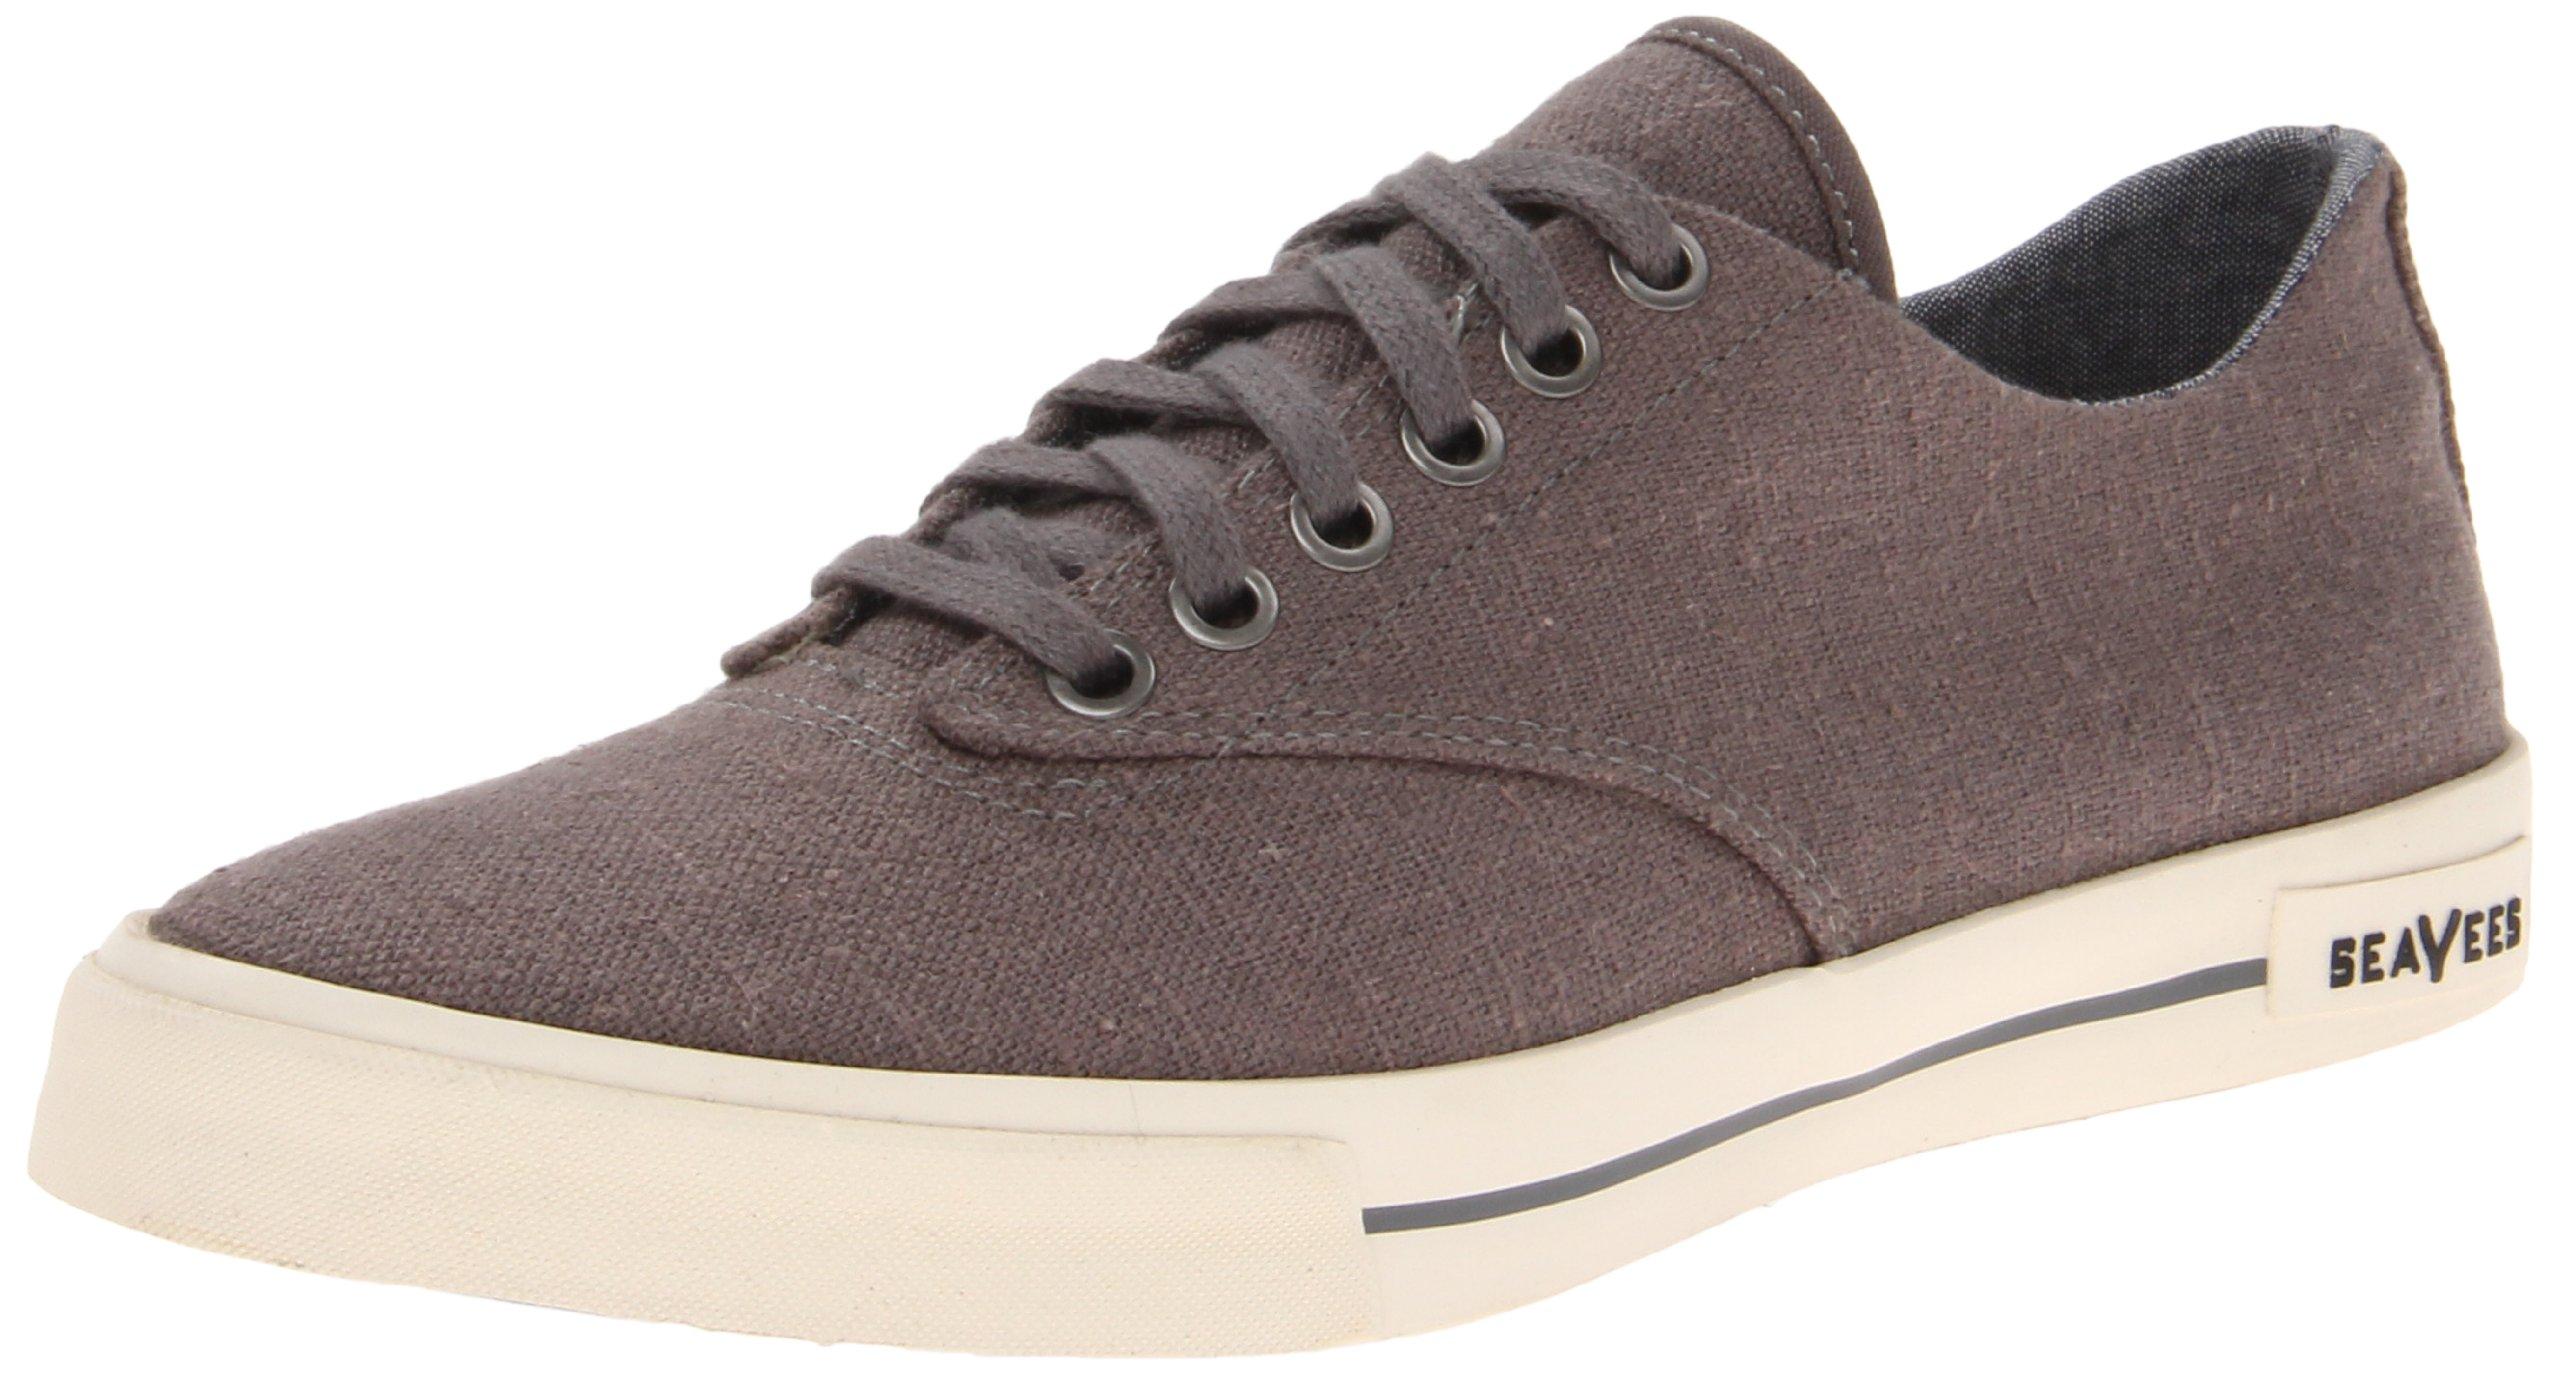 SeaVees Men's 08/63 Hermosa Plimsoll Core Tennis Shoe,Tin Grey Vintage Wash Linen,12 M US